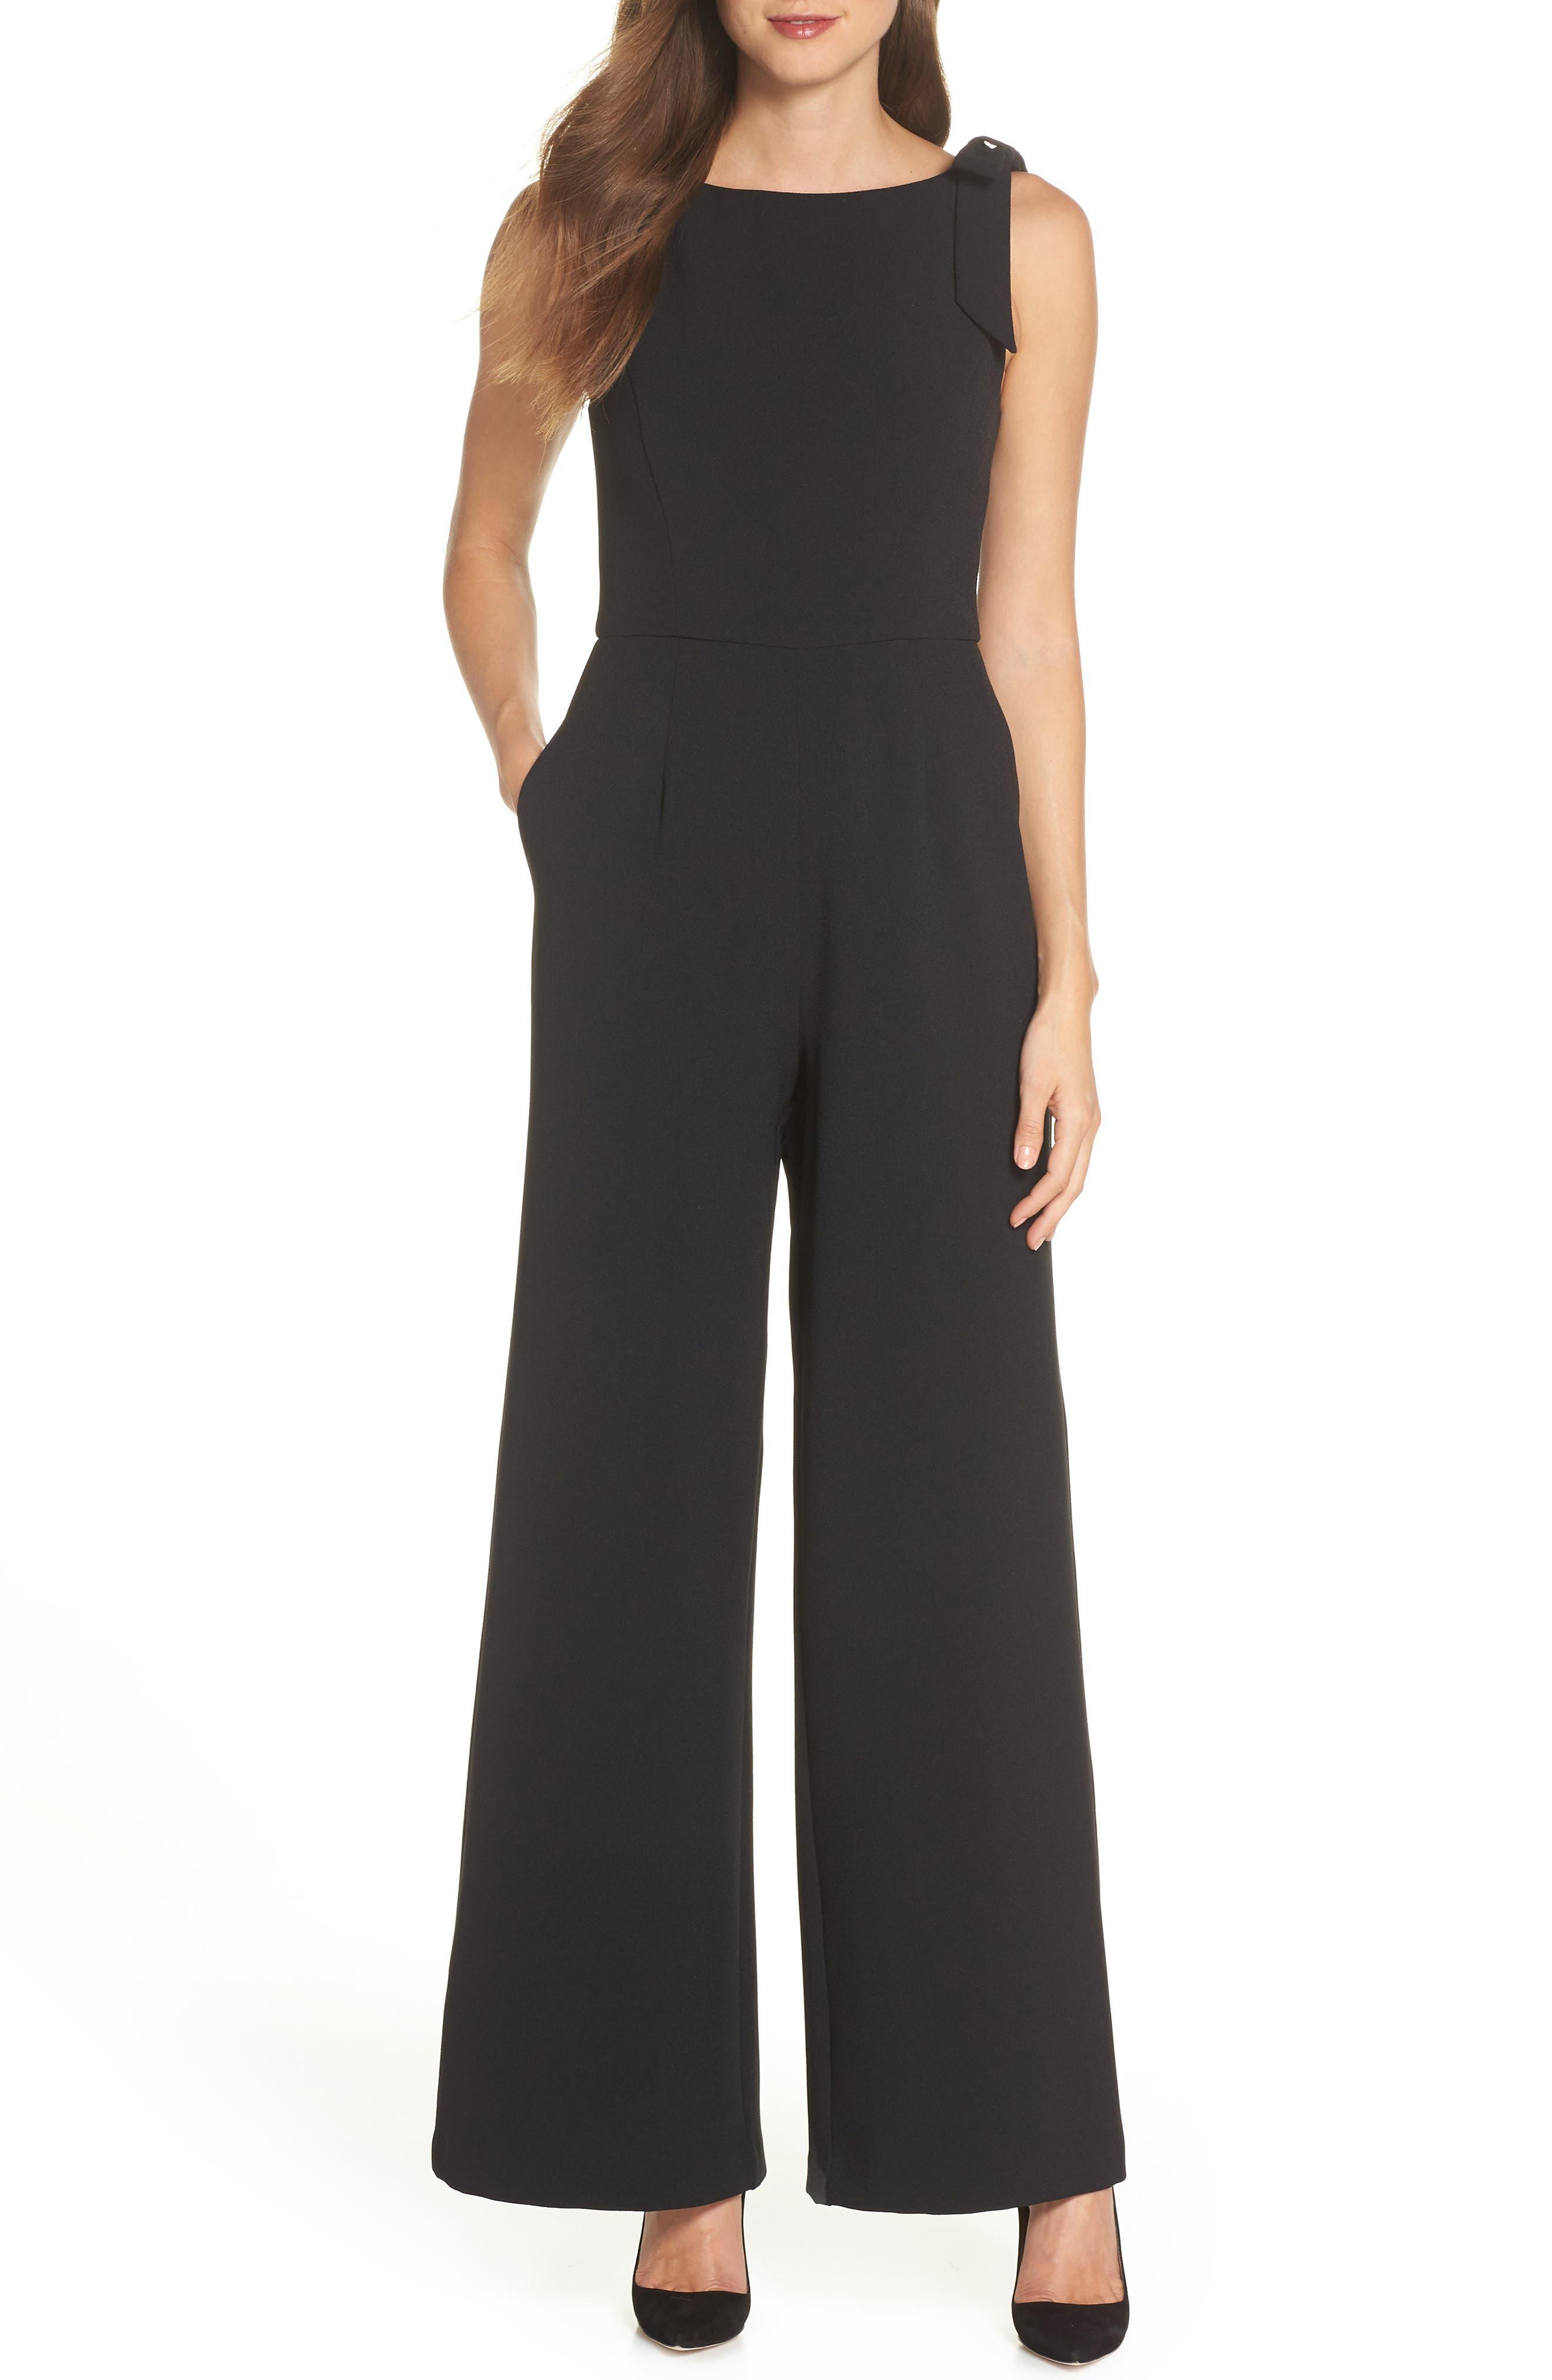 JULIA JORDAN, Shoulder Bow Jumpsuit, Main thumbnail 1, color, BLACK